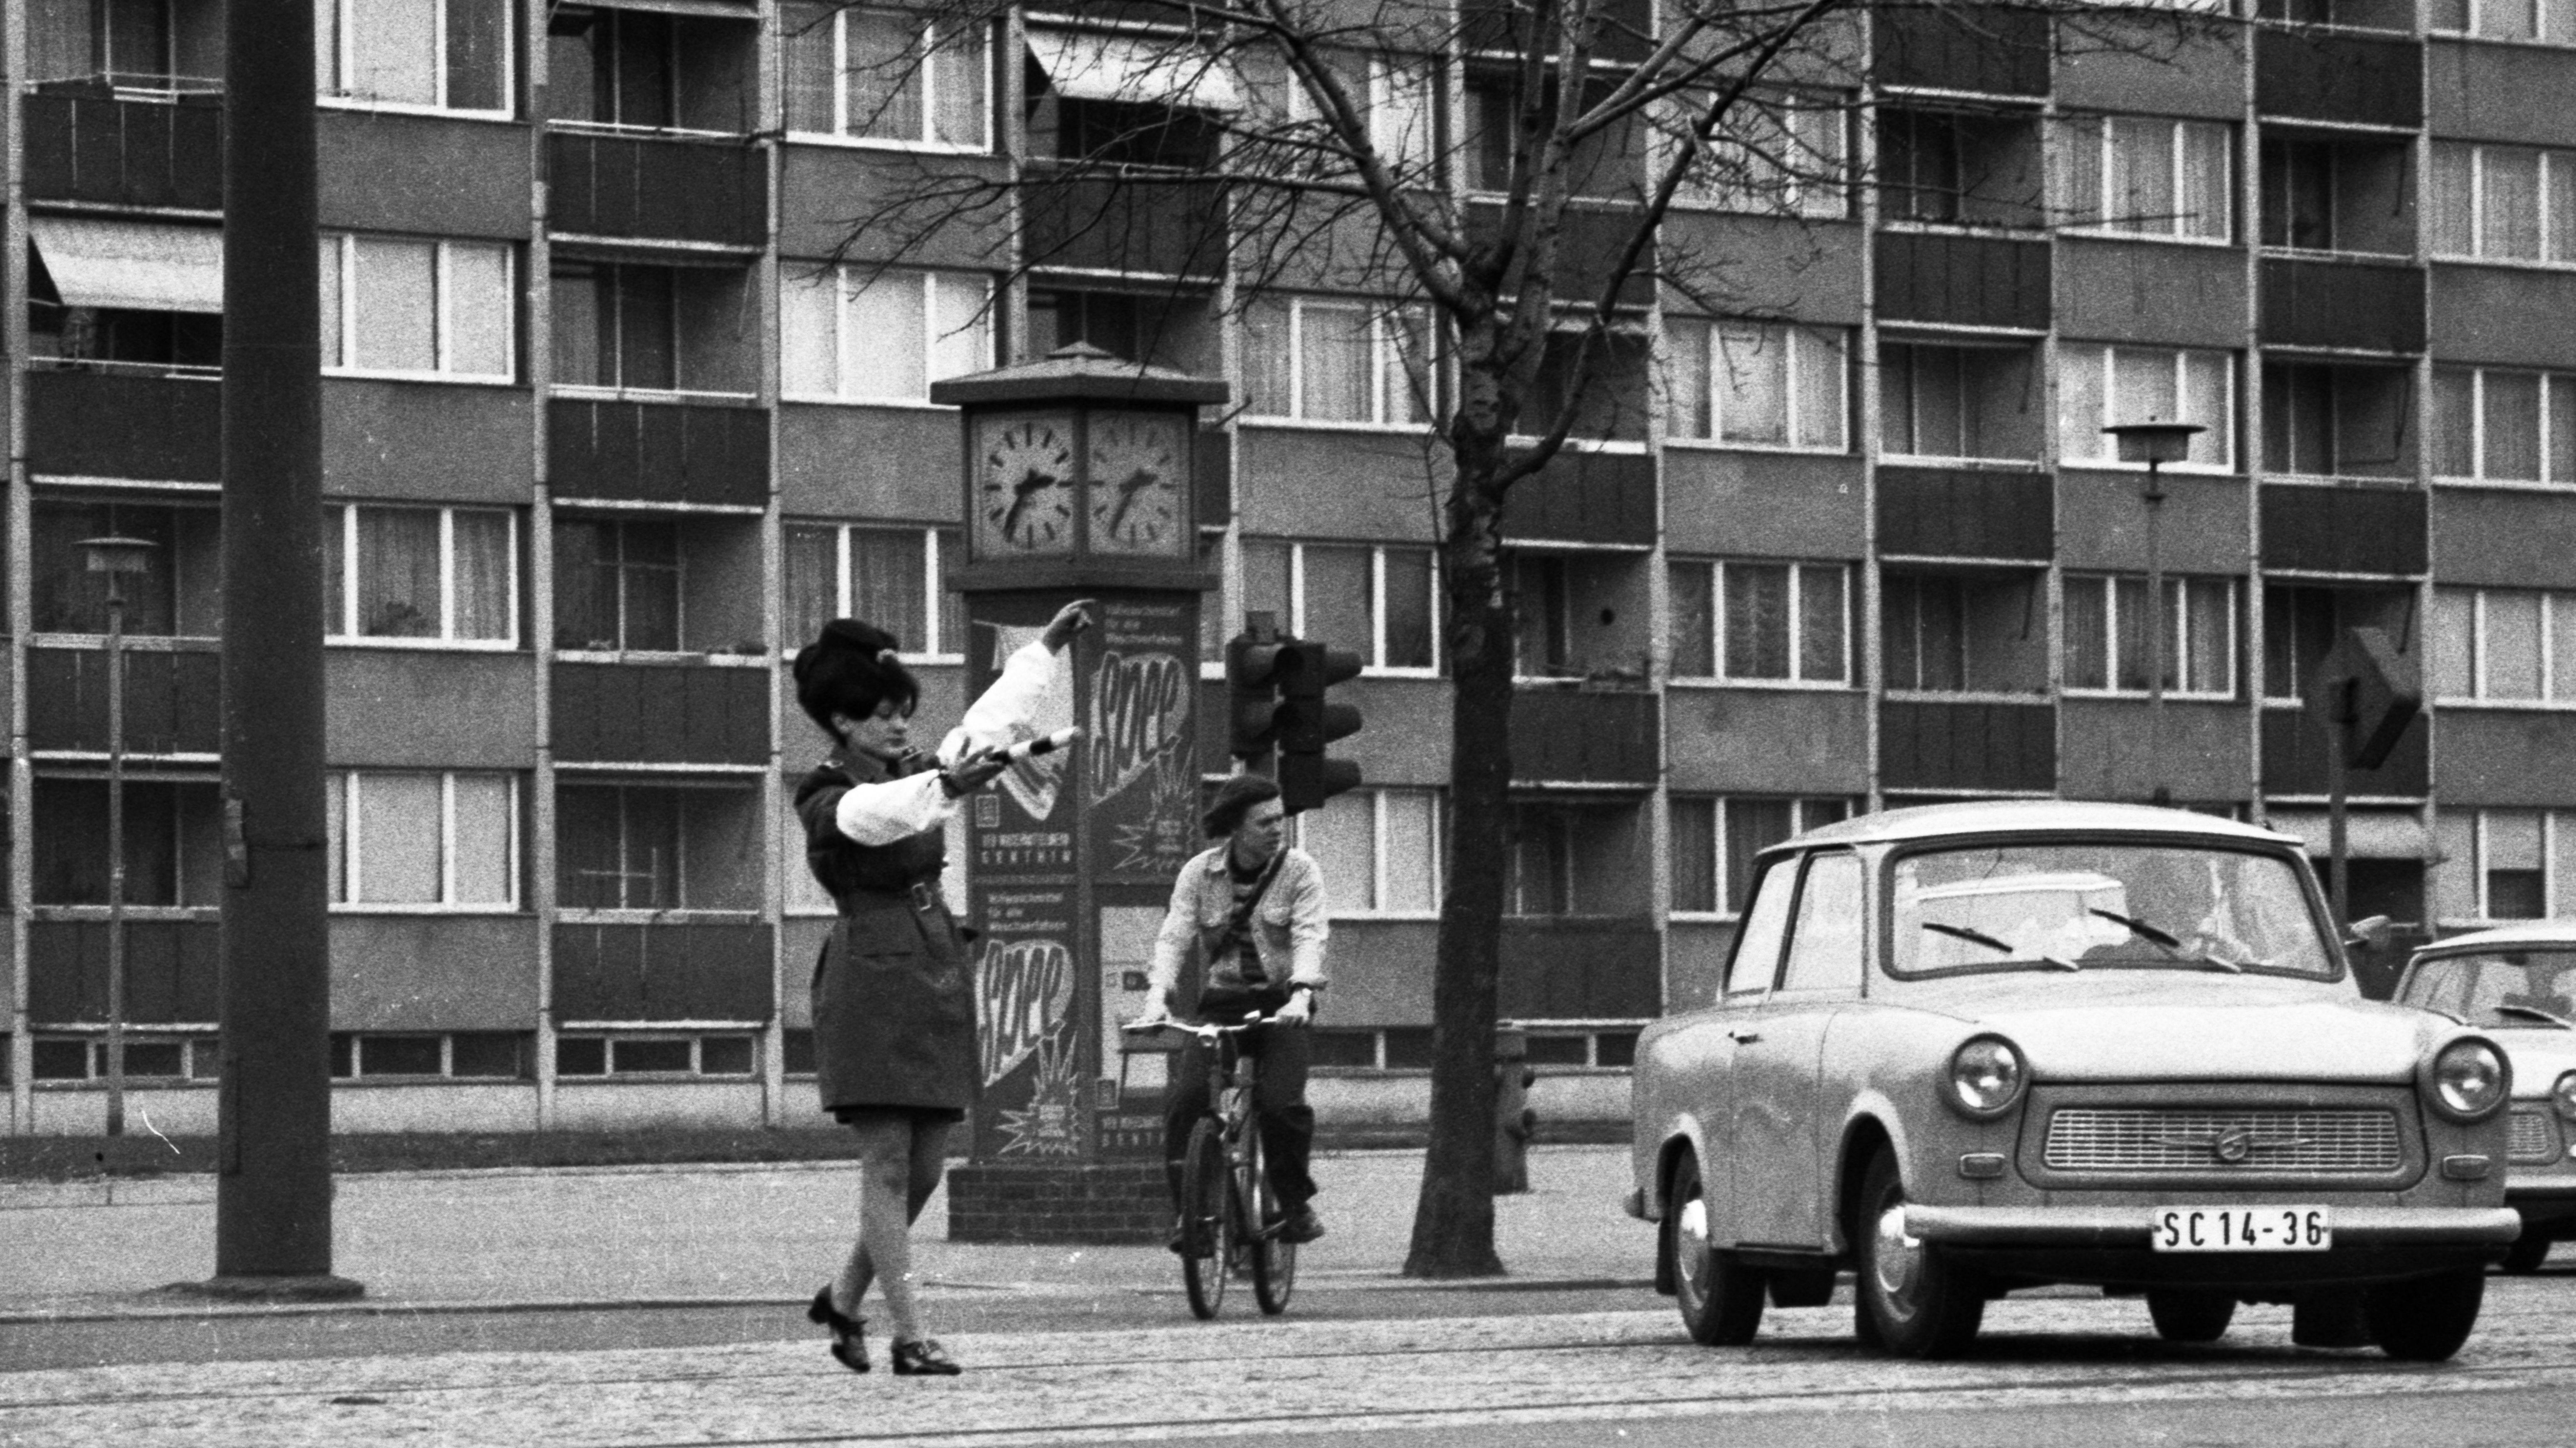 Straßenszene mit Trabbi in Leipzig 1974